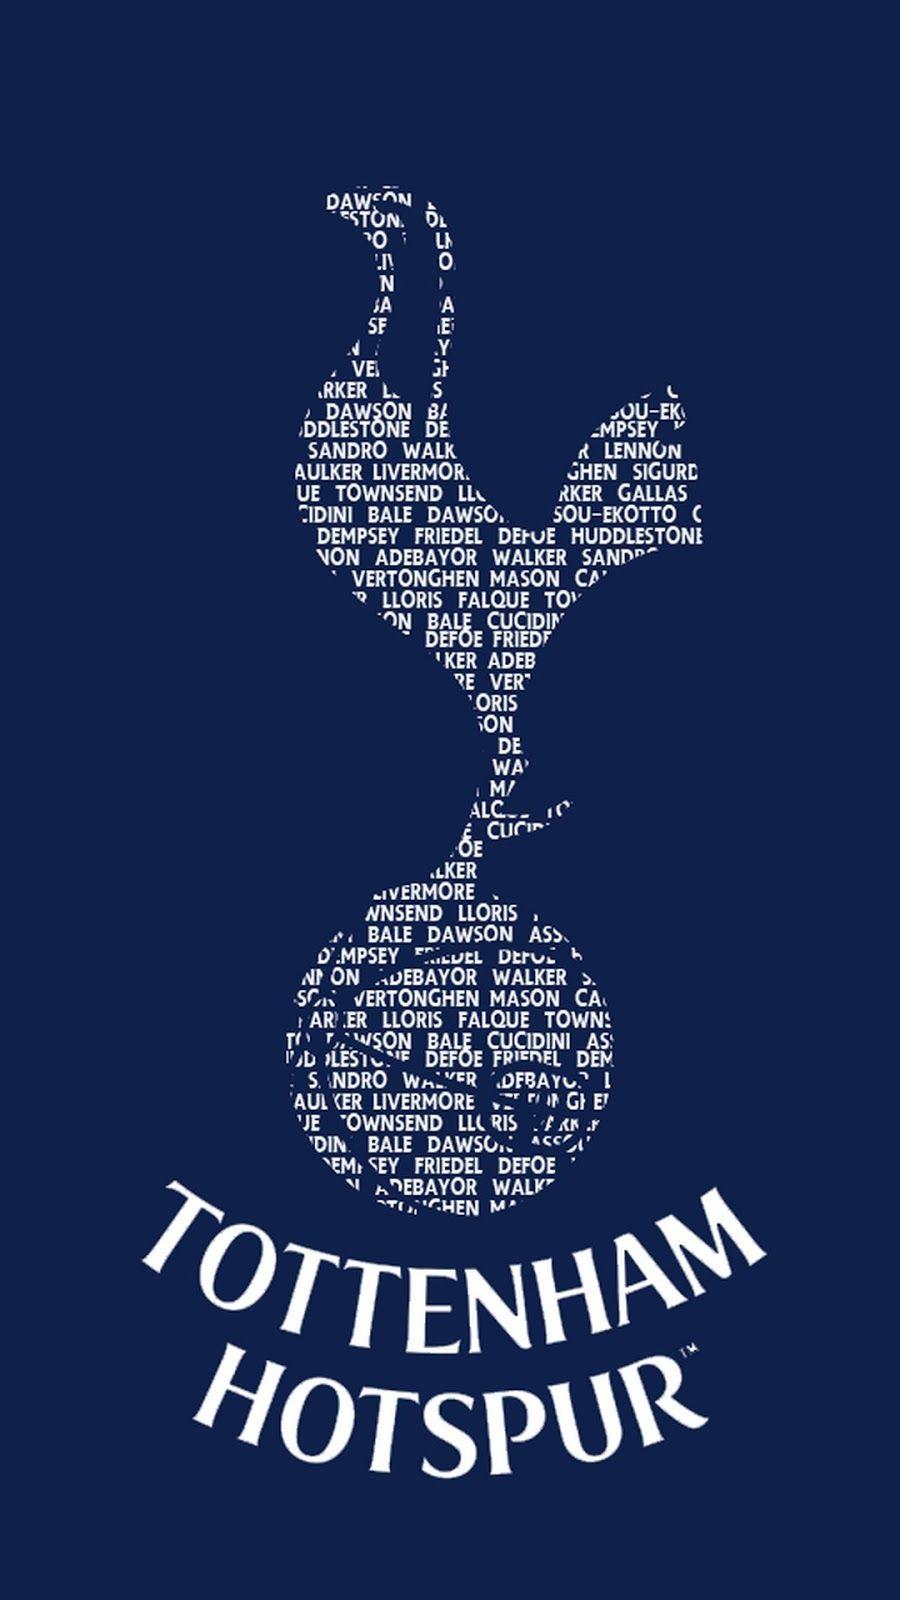 Tottenham Hotspur Football Iphone Wallpaper In 2020 Tottenham Wallpaper Tottenham Hotspur Tottenham Hotspur Wallpaper